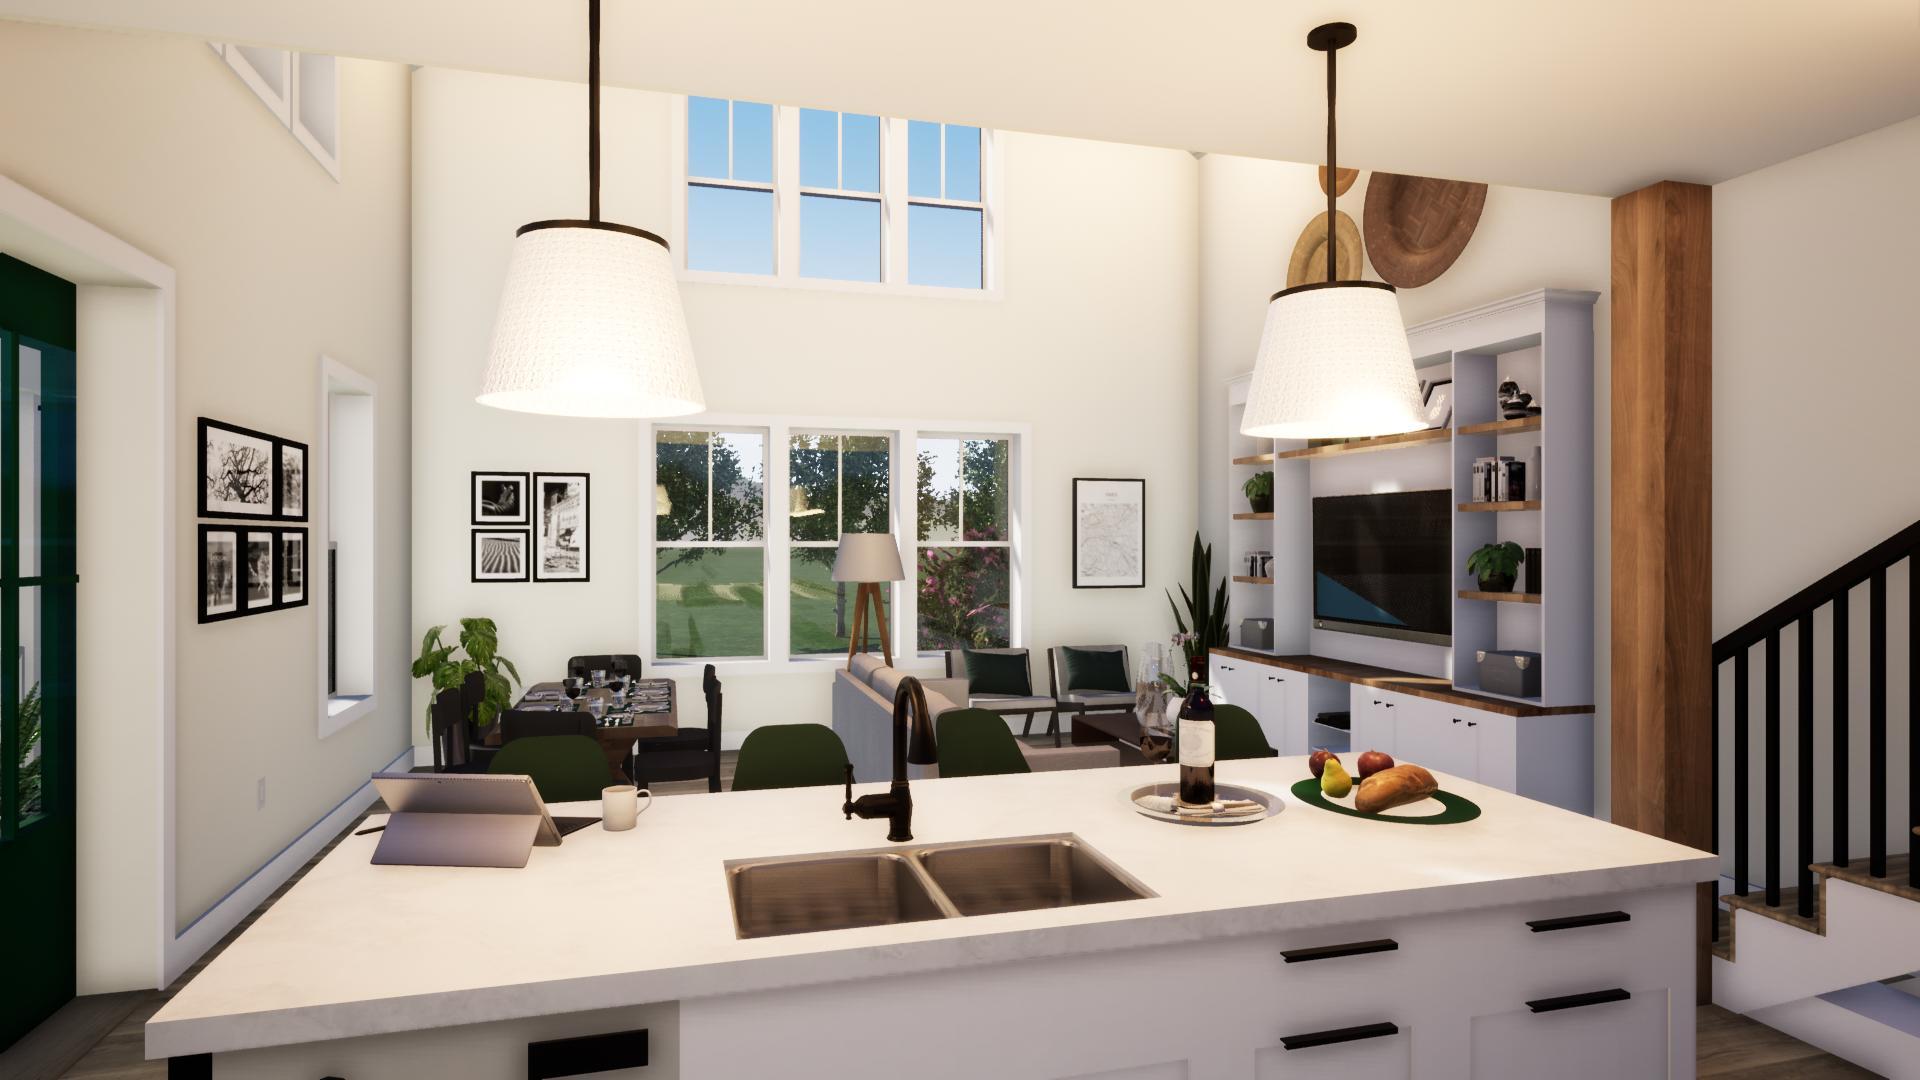 Ashley Forest Homes For Sale - 2 Live Oak, Charleston, SC - 2